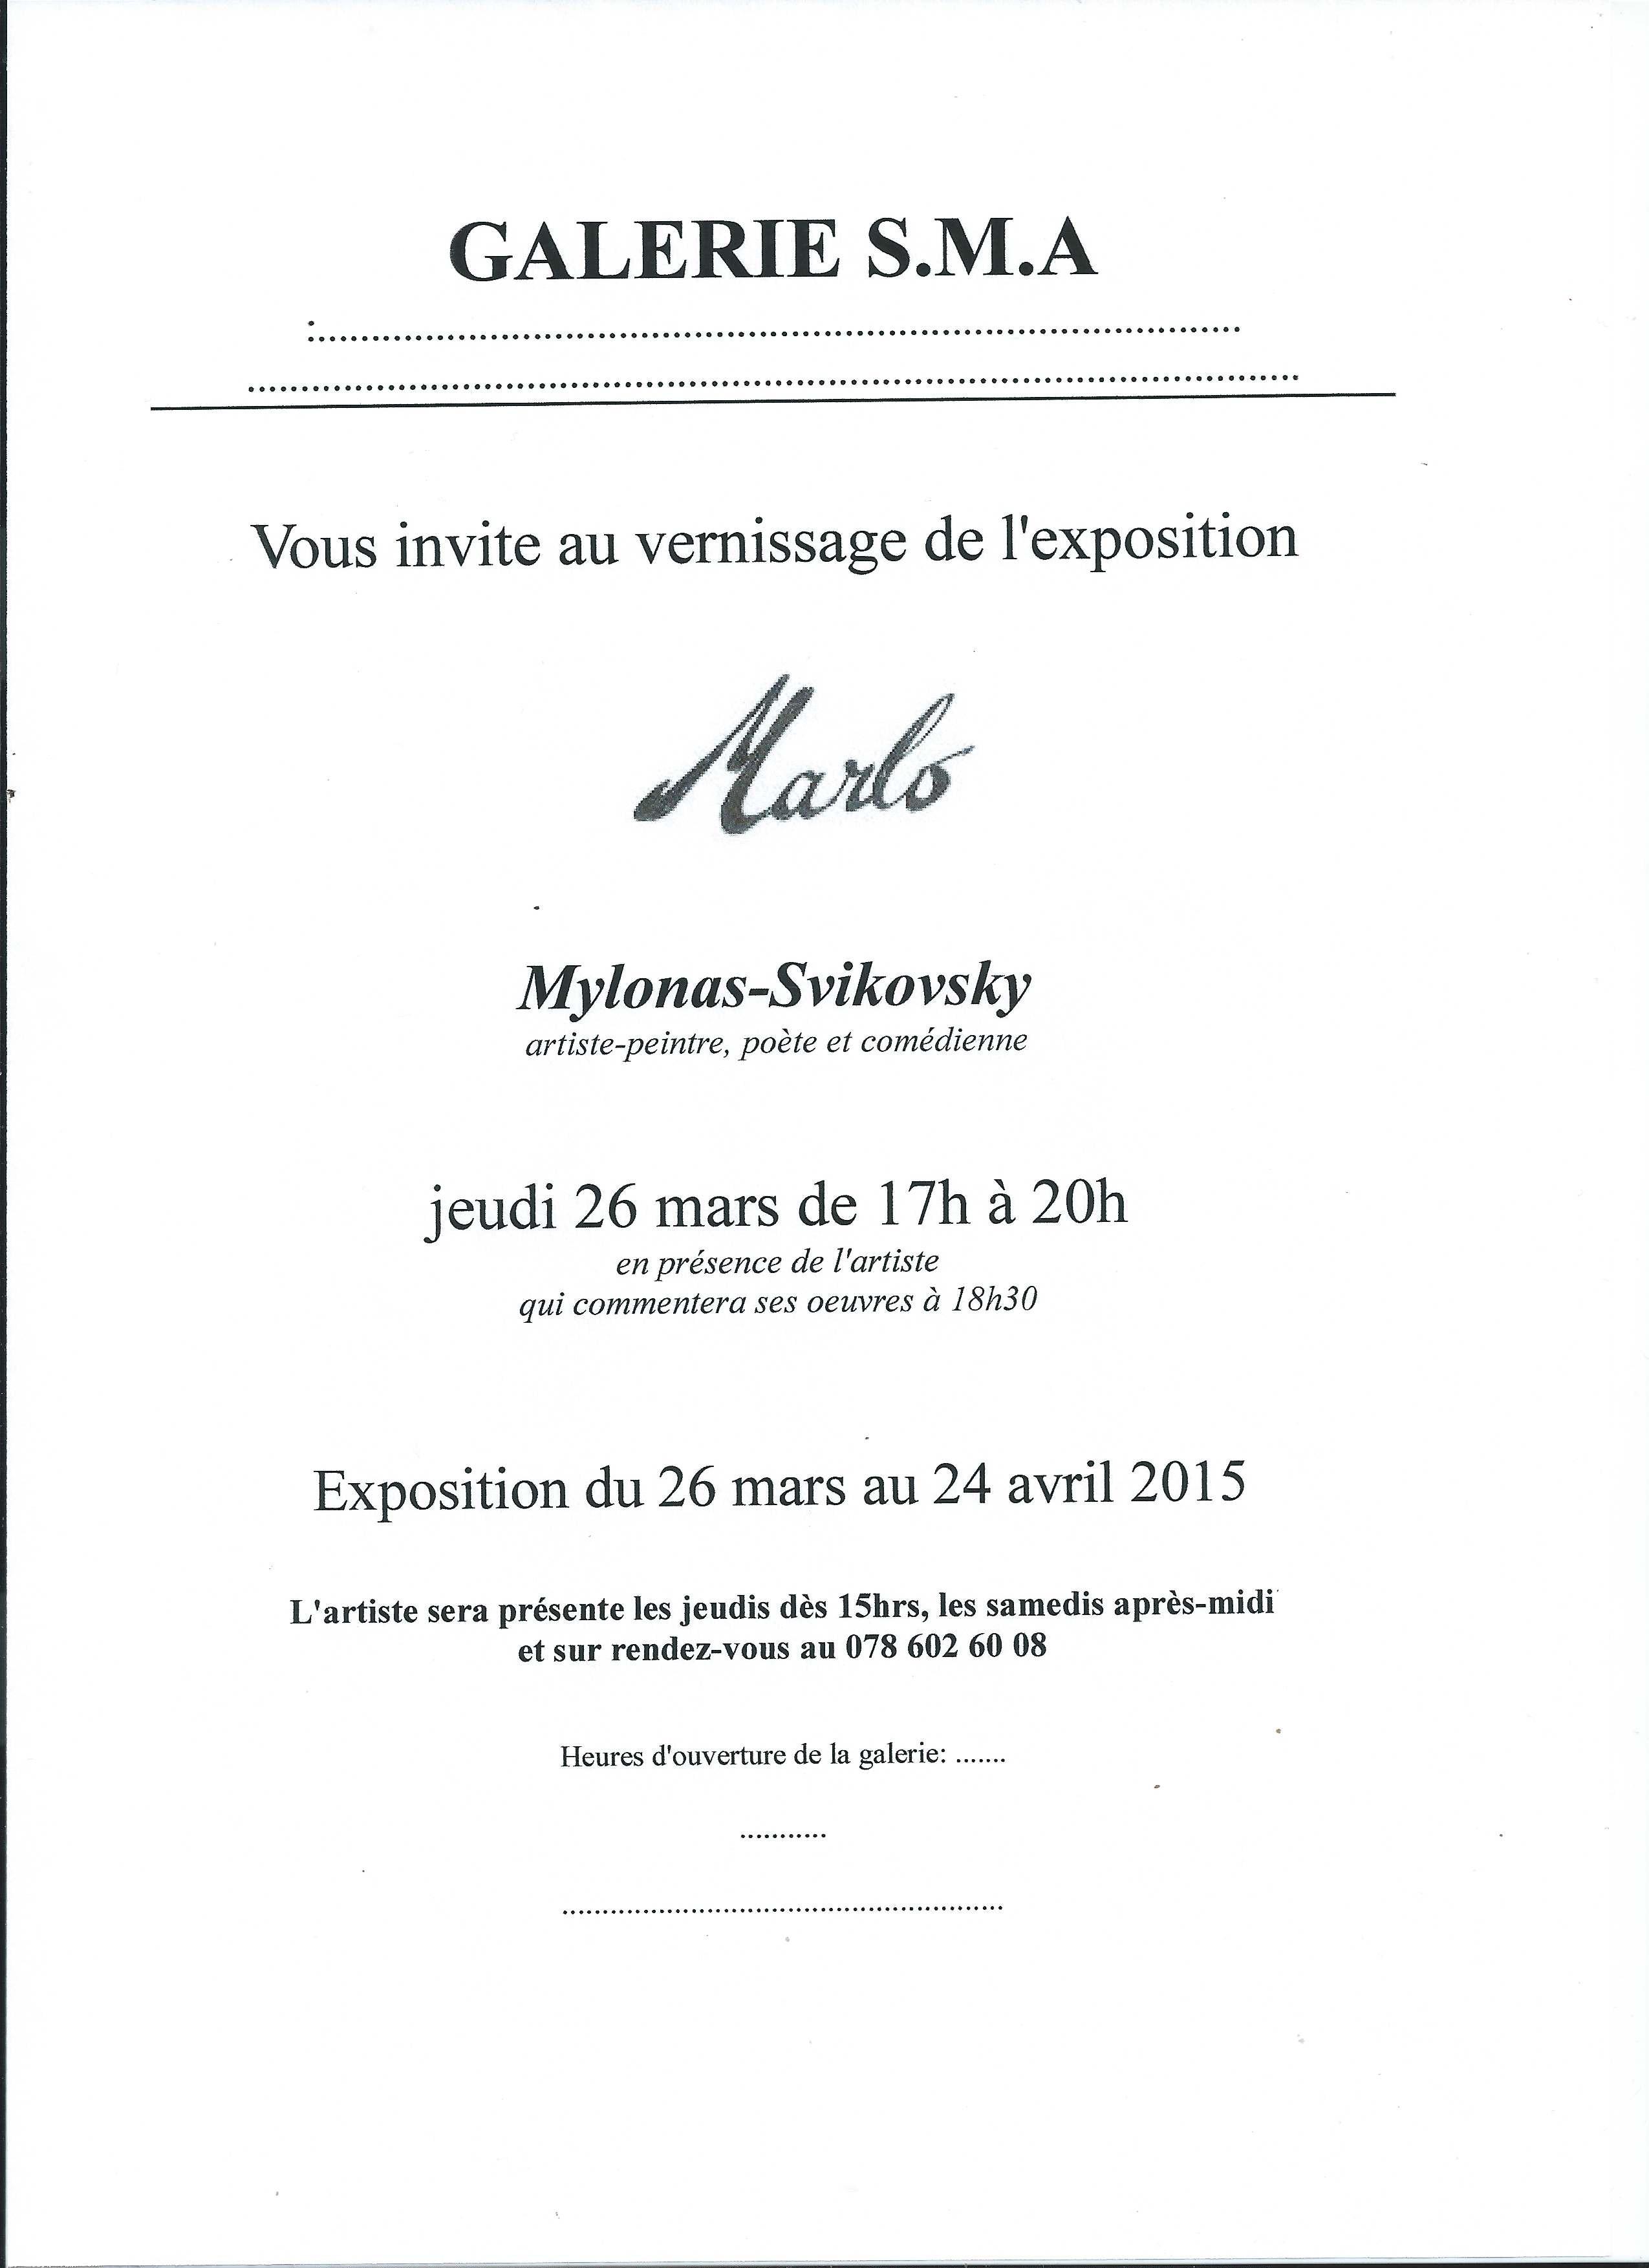 SMA dos invitation